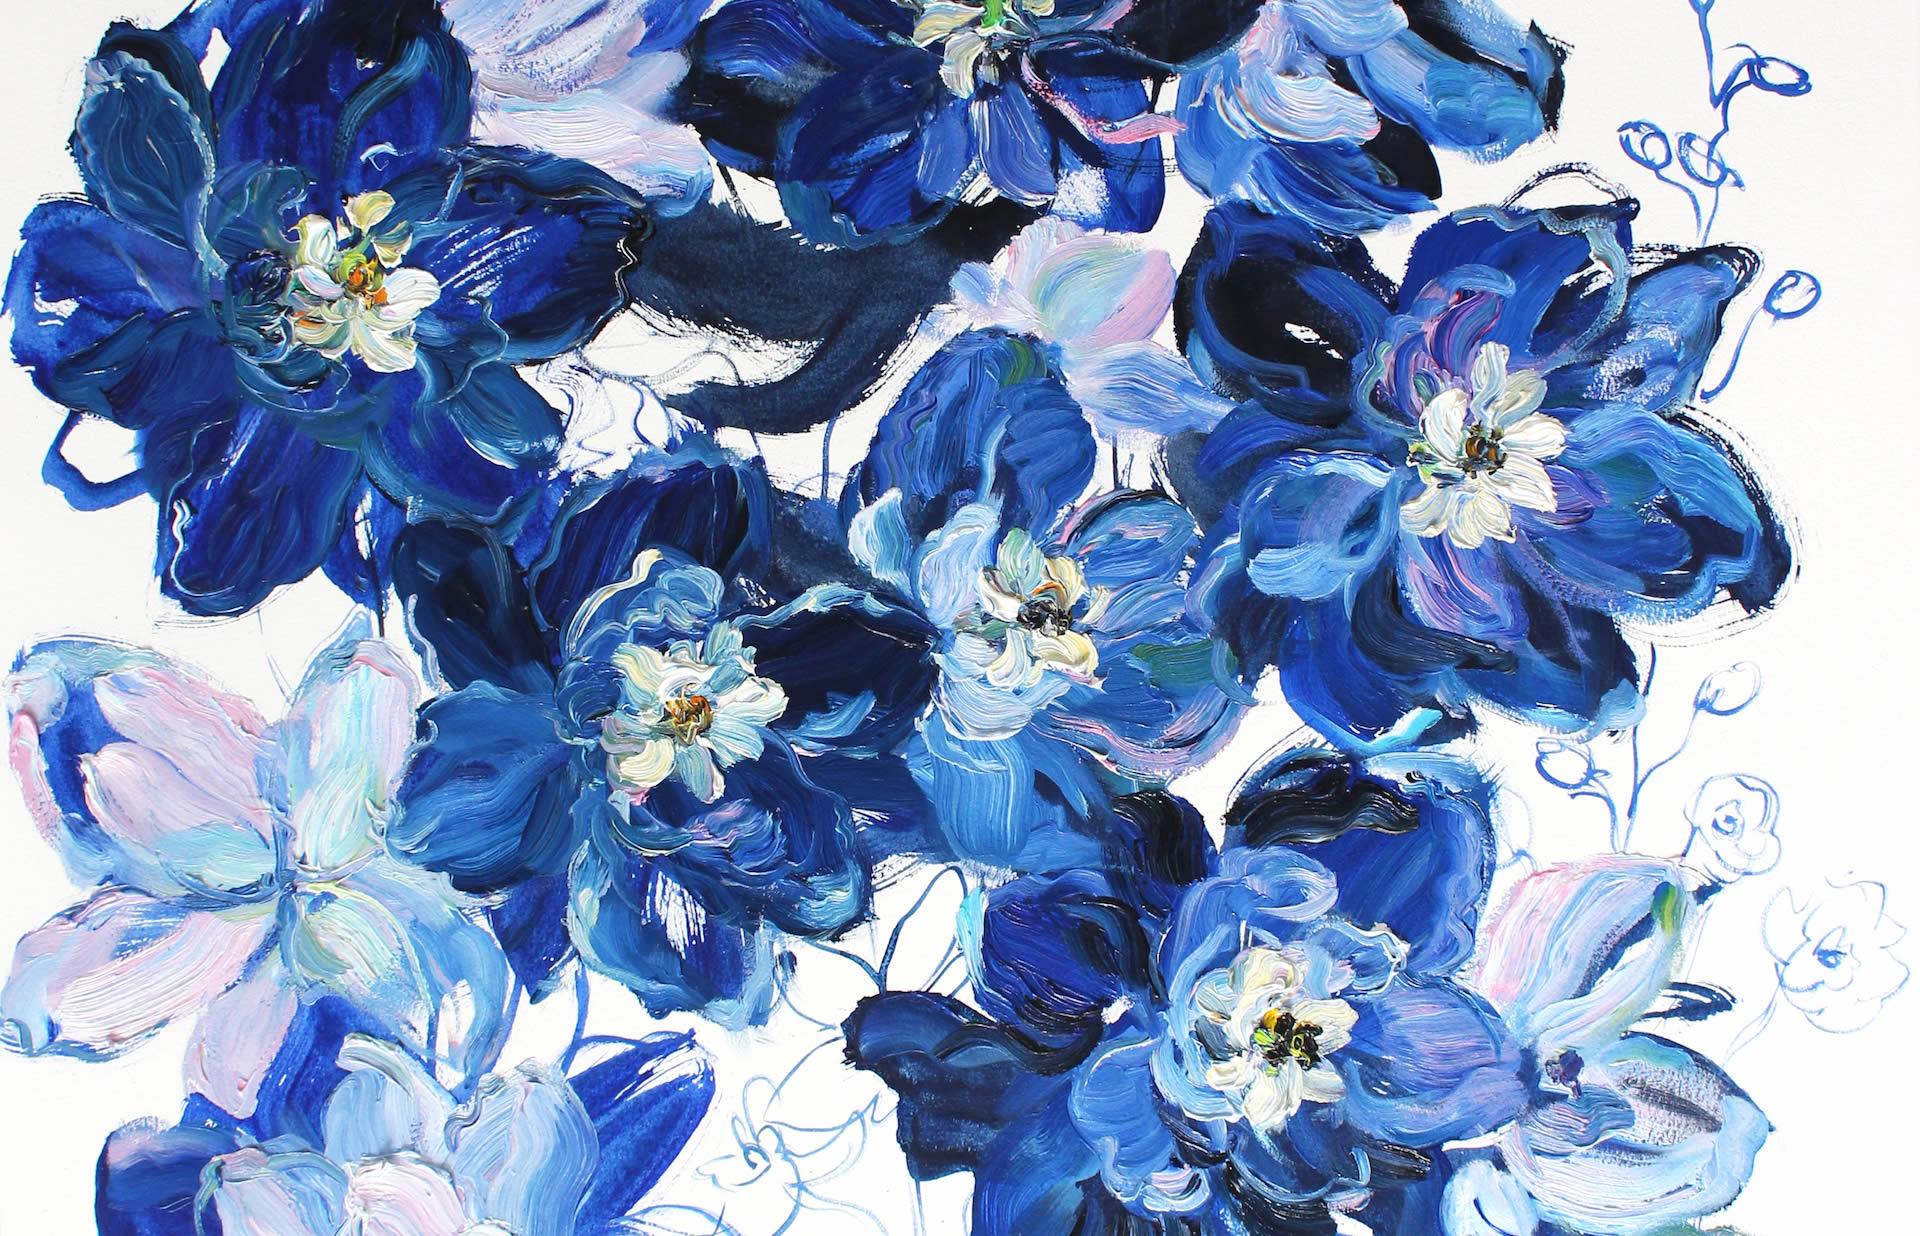 Krista-Johnson-Delphiniums-Flurry-Of-Blues-2019-Oil-On-Paper-30x22-850-Online-Art-Galleries